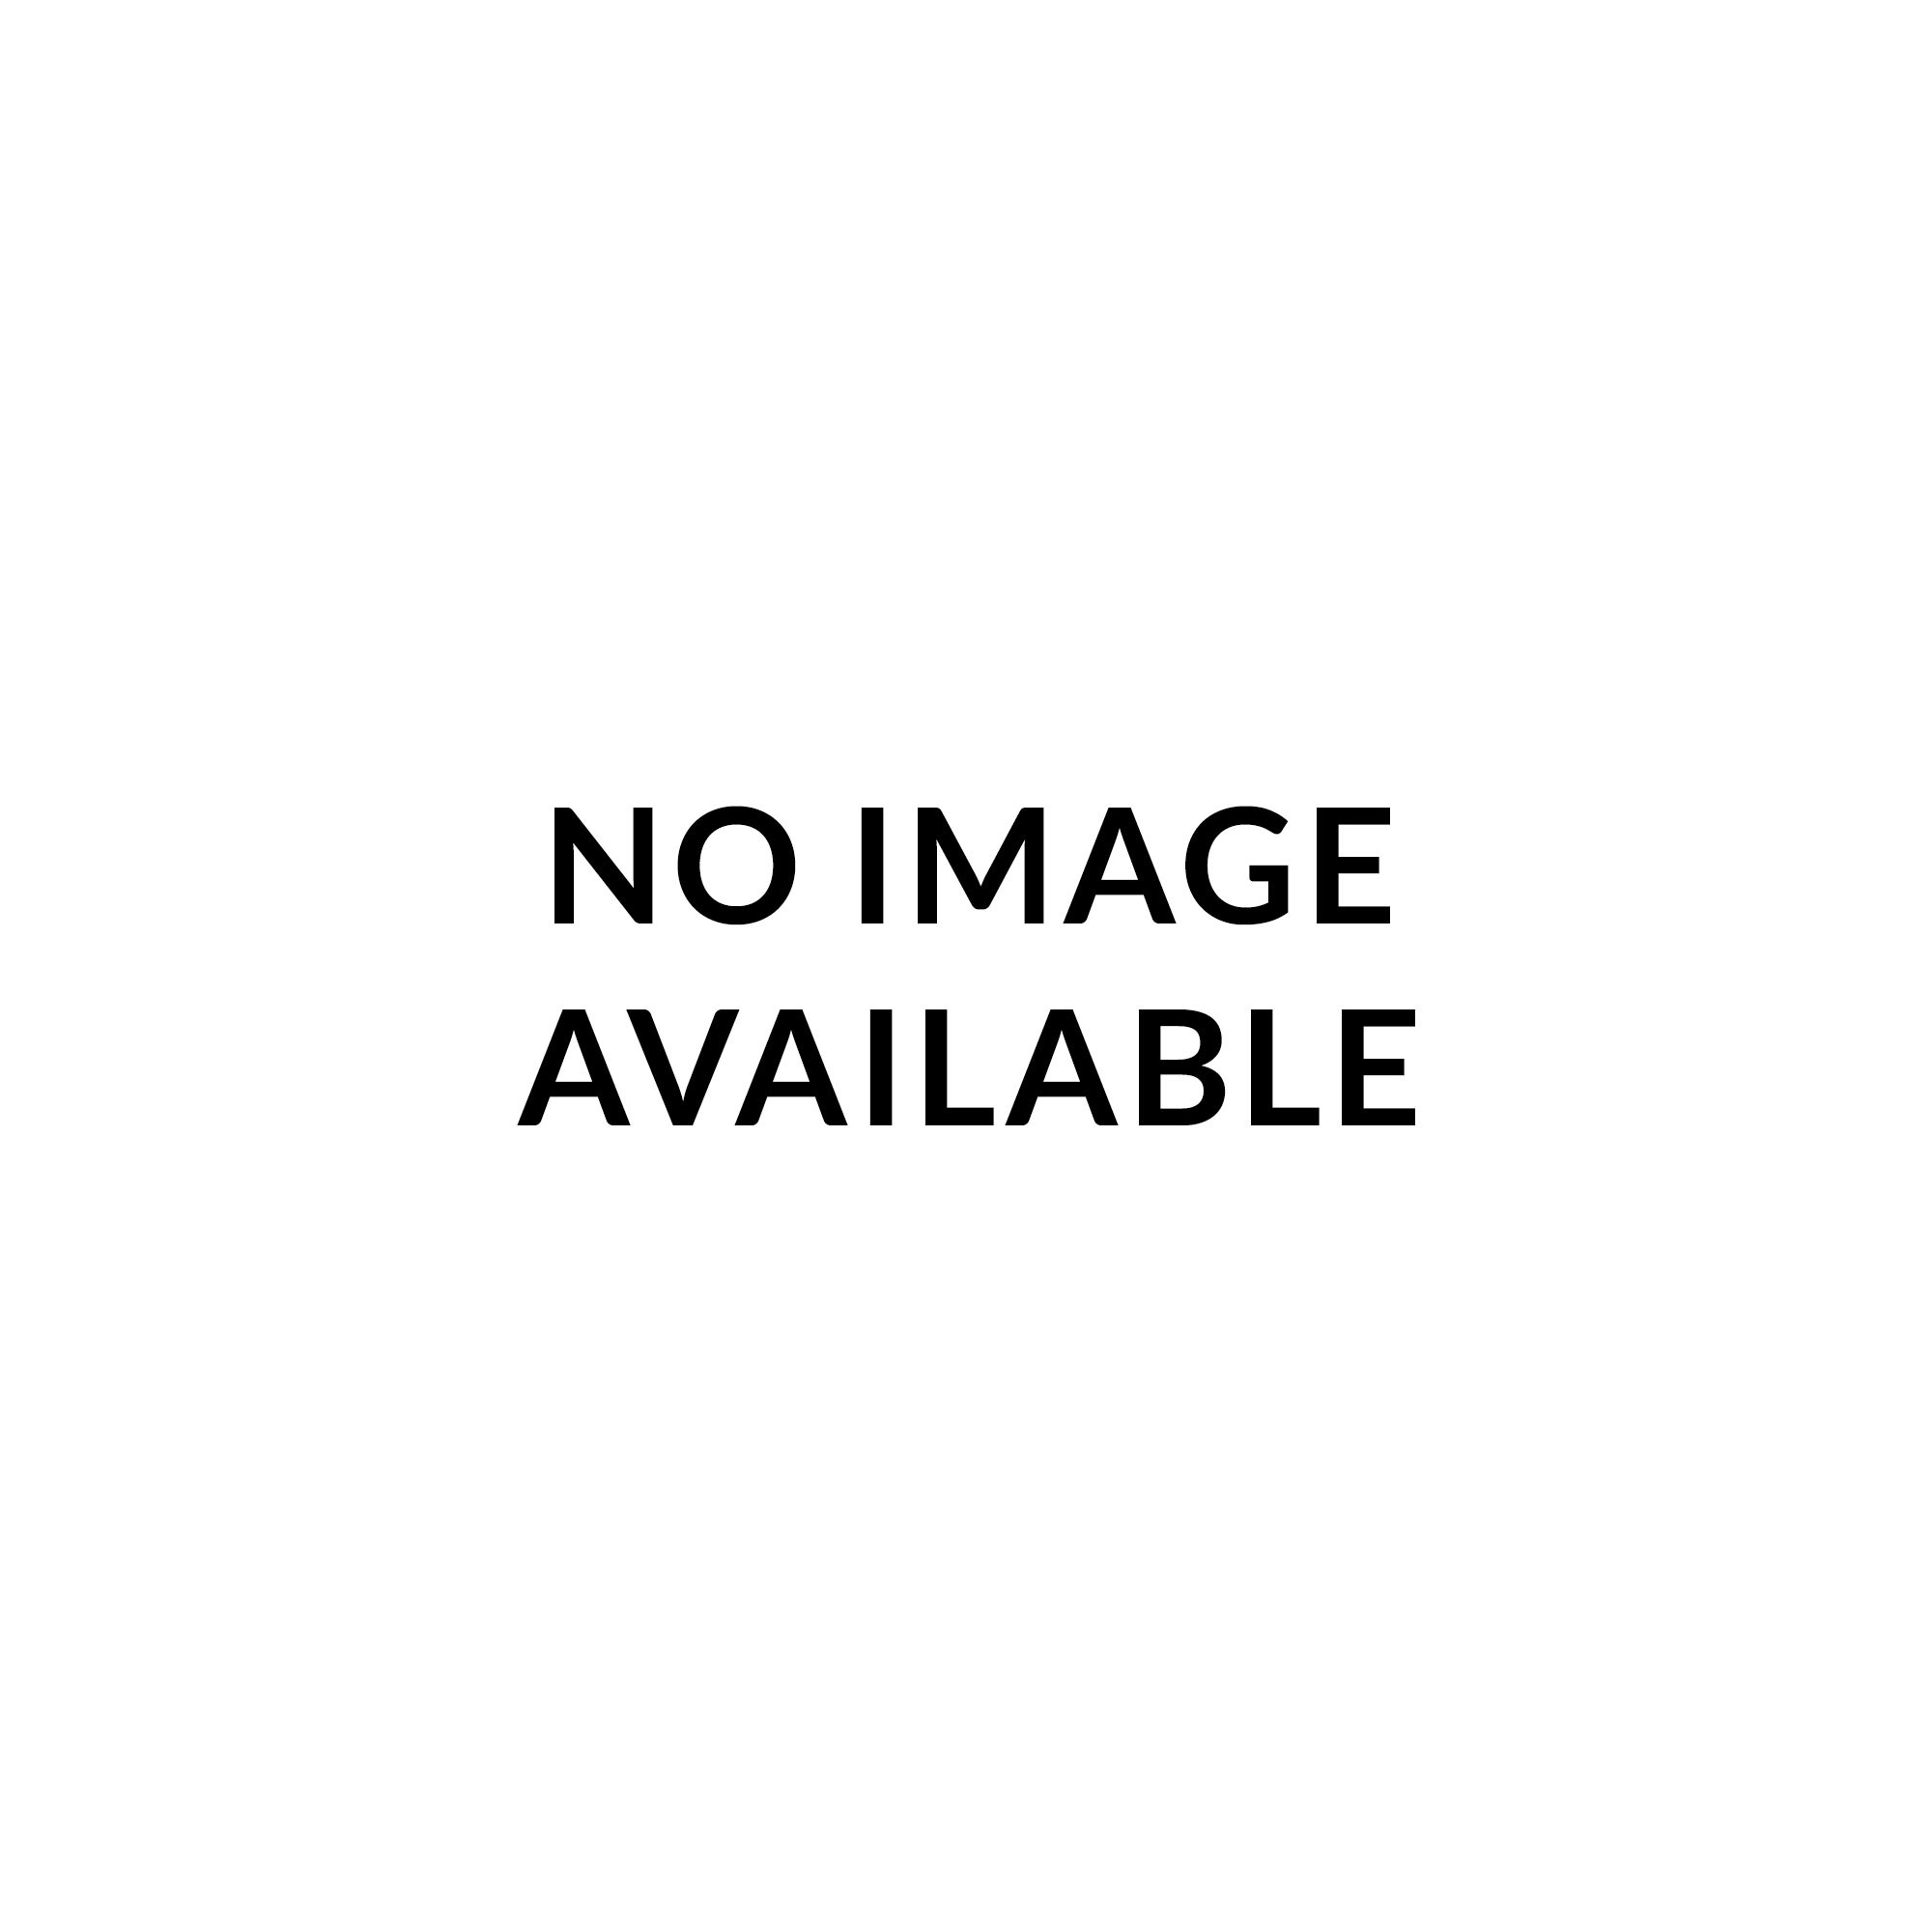 D'Addario PSB145 ProSteels XL Bass Guitar Single String .145 Gauge - Long Scale